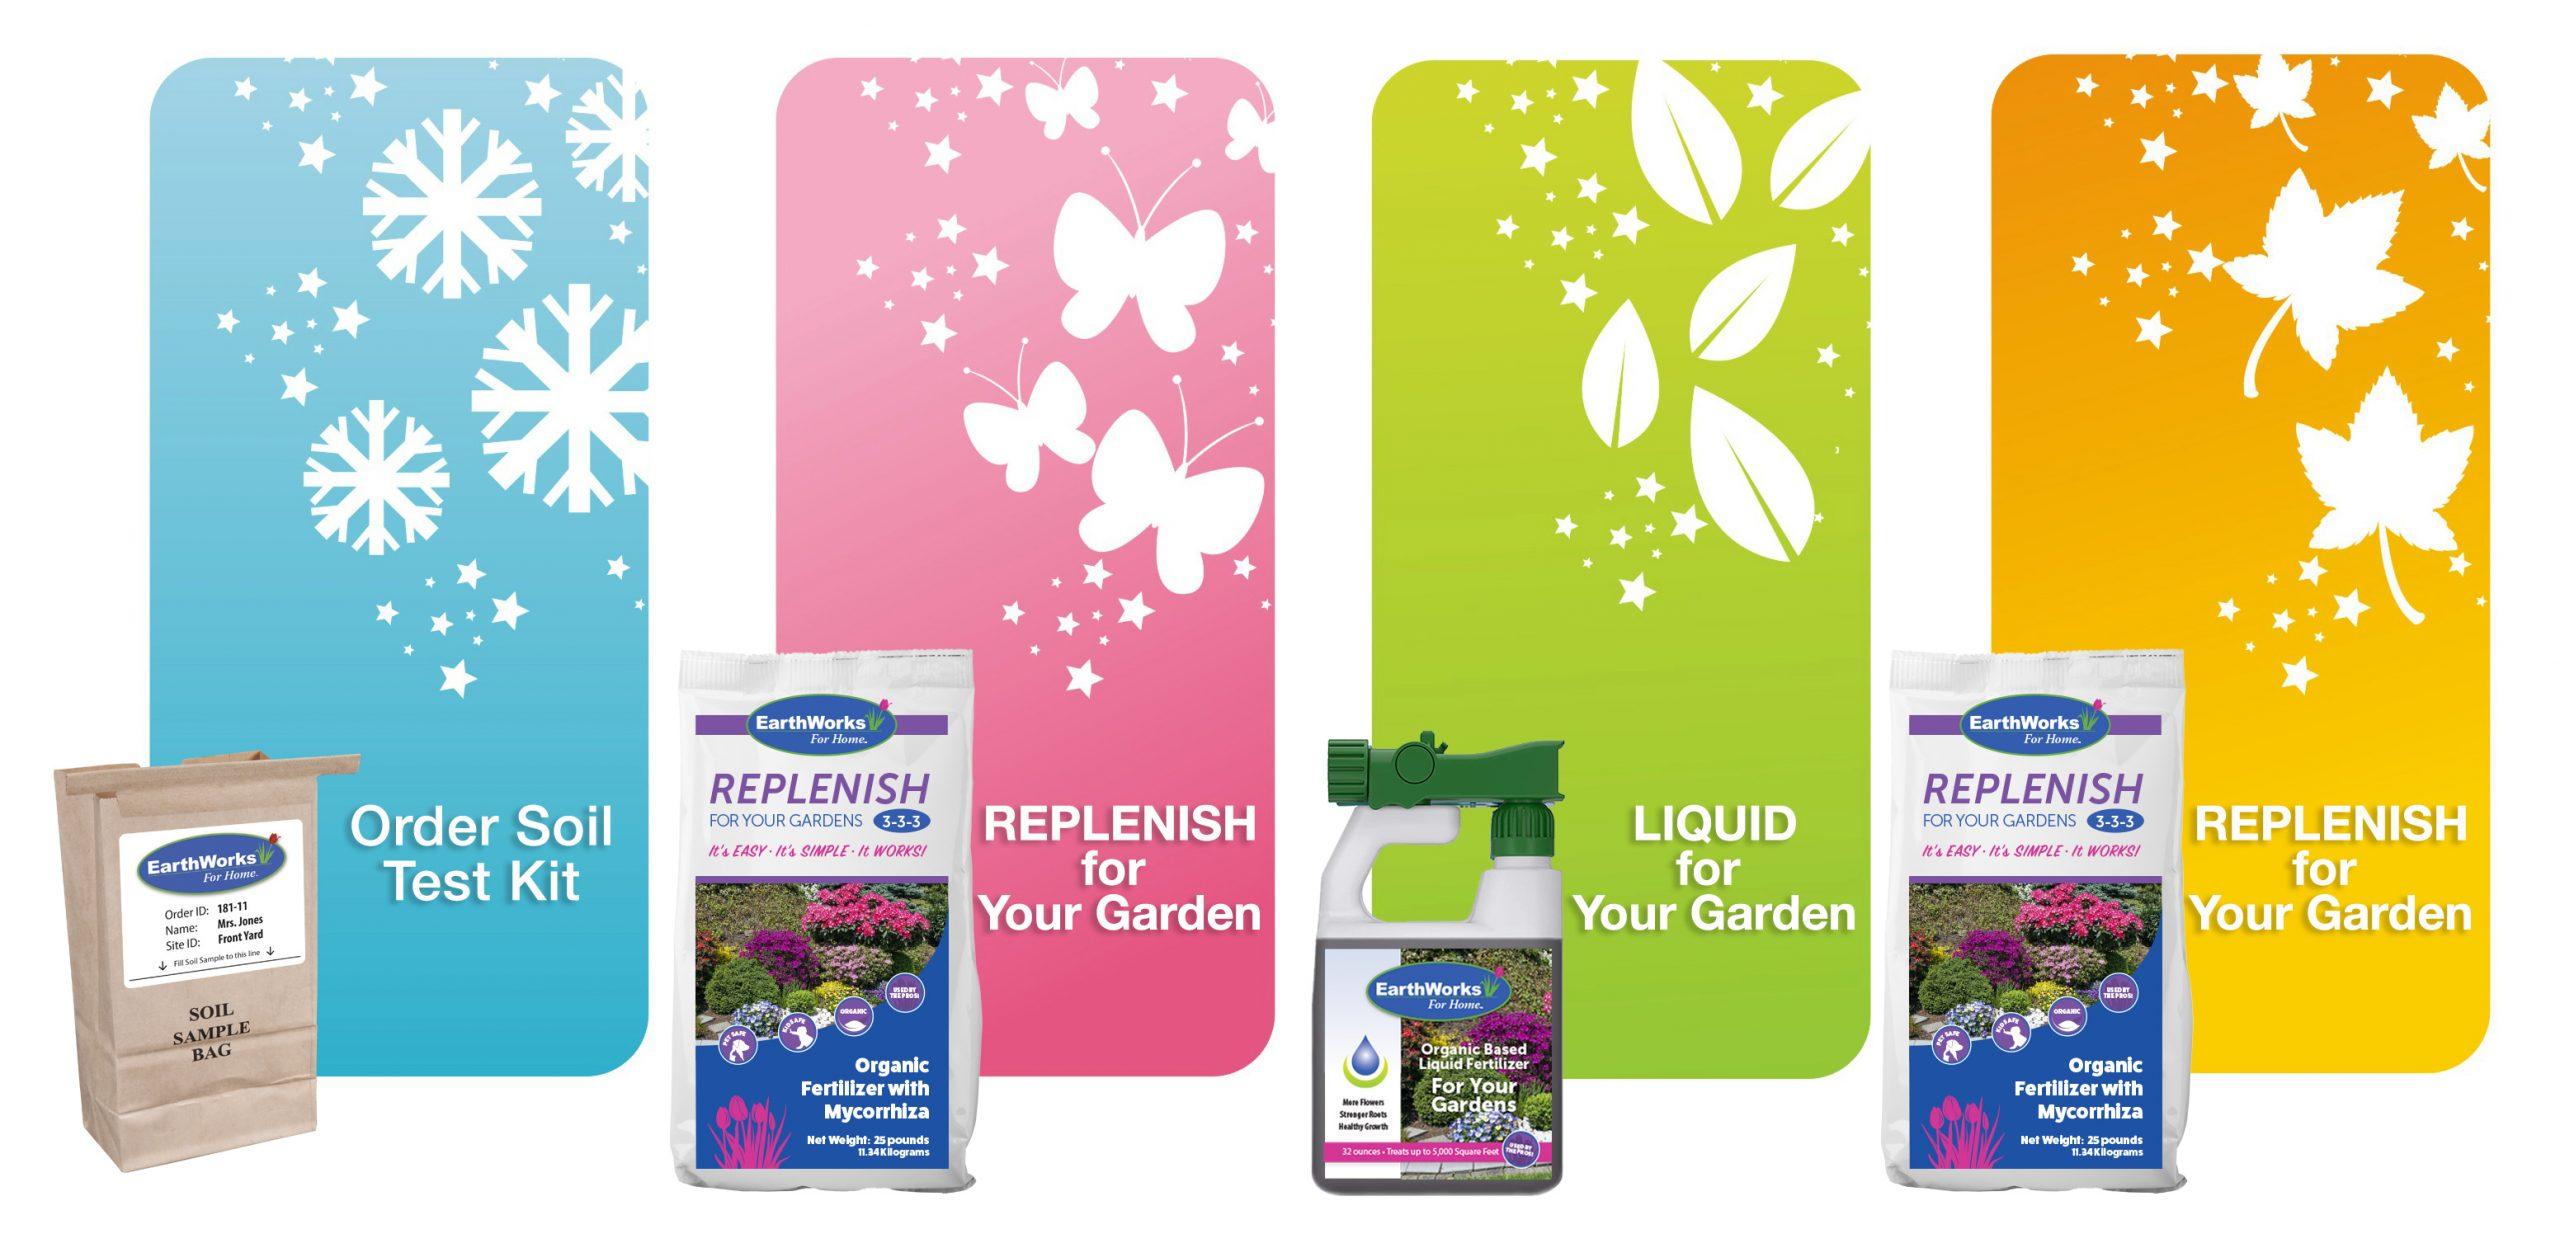 GardenProgram-Seasons-3